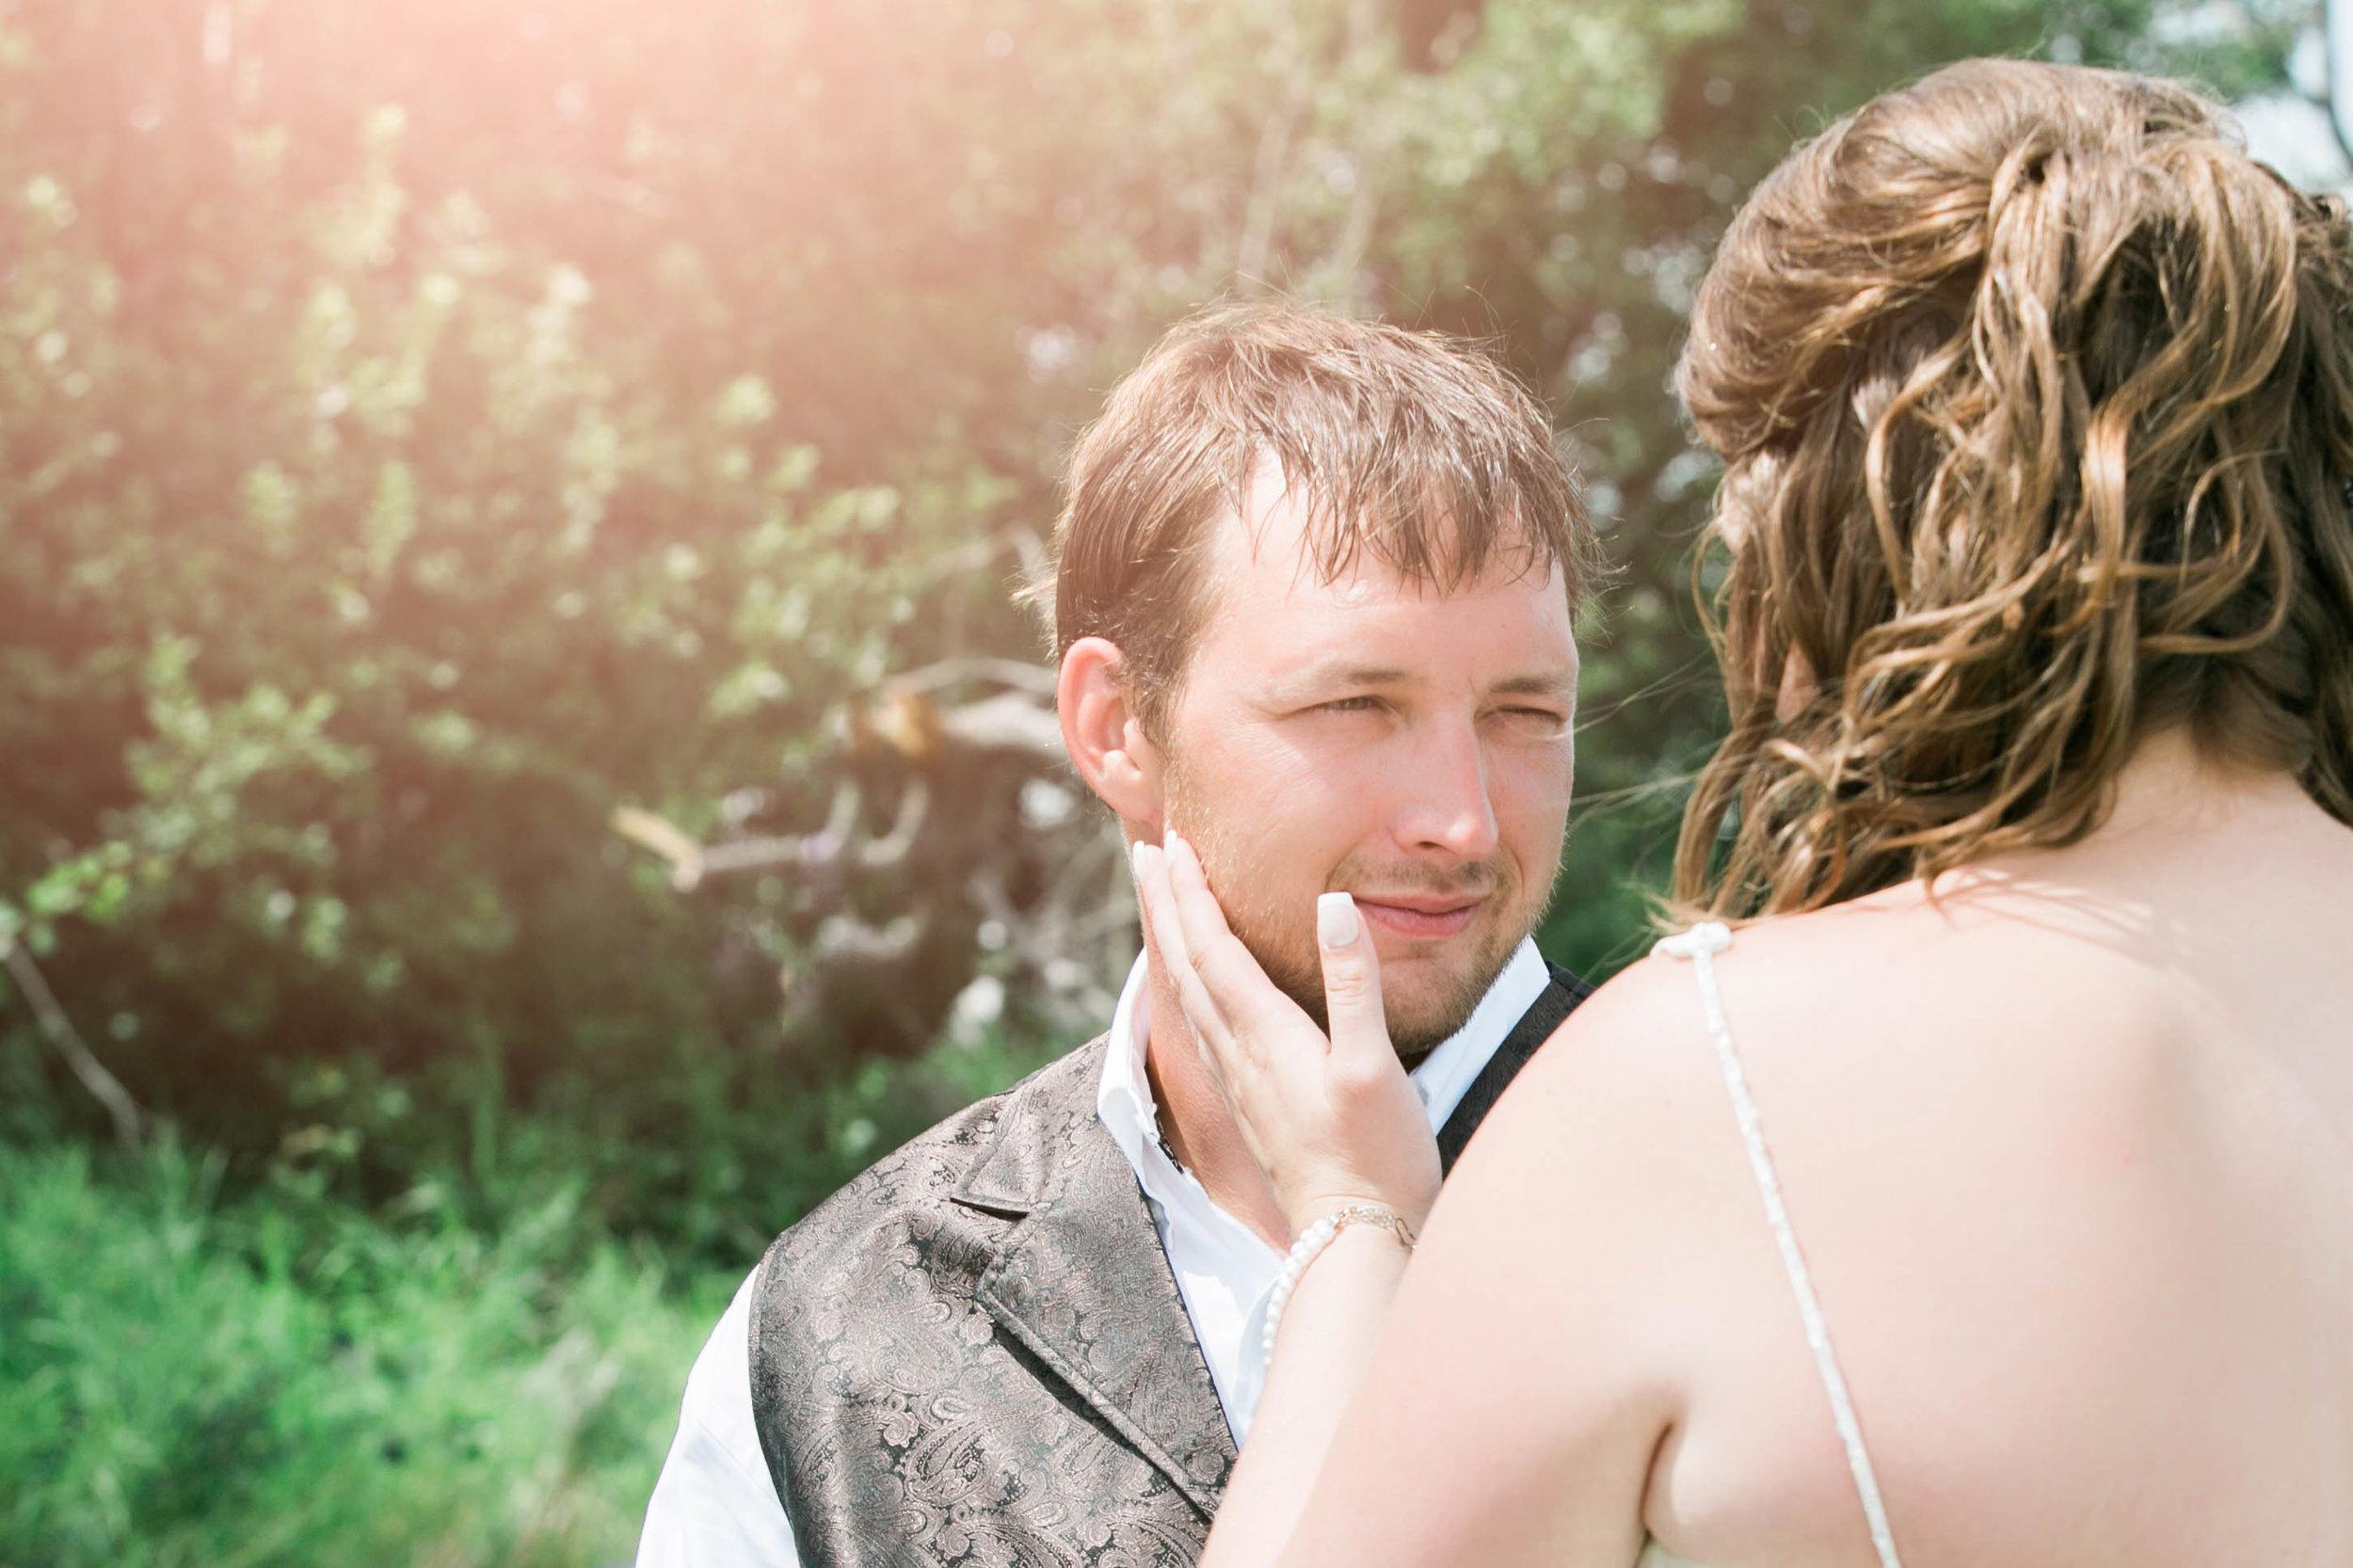 weddingphotos-197.jpg